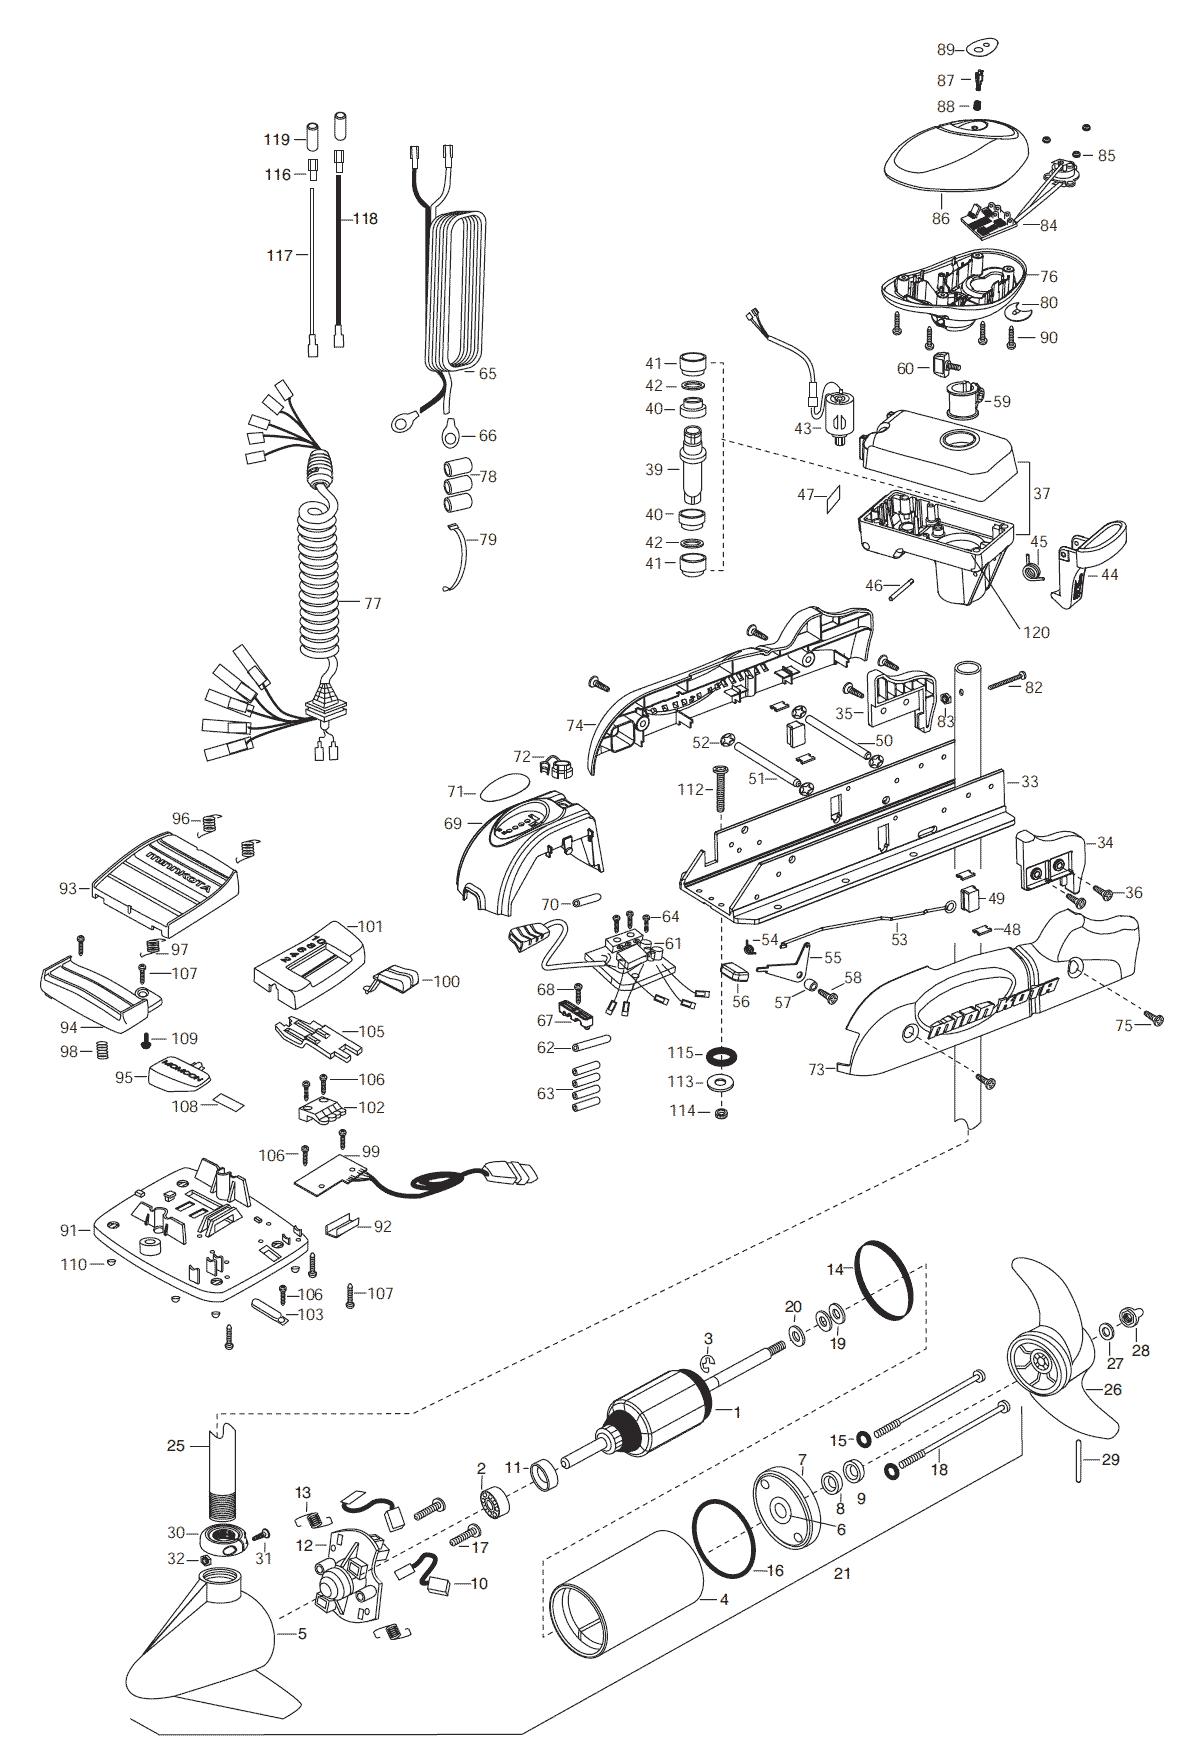 minn kota fortrex 80 parts diagram detailed neuron riptide autopilot 65 54 inch 2003 from